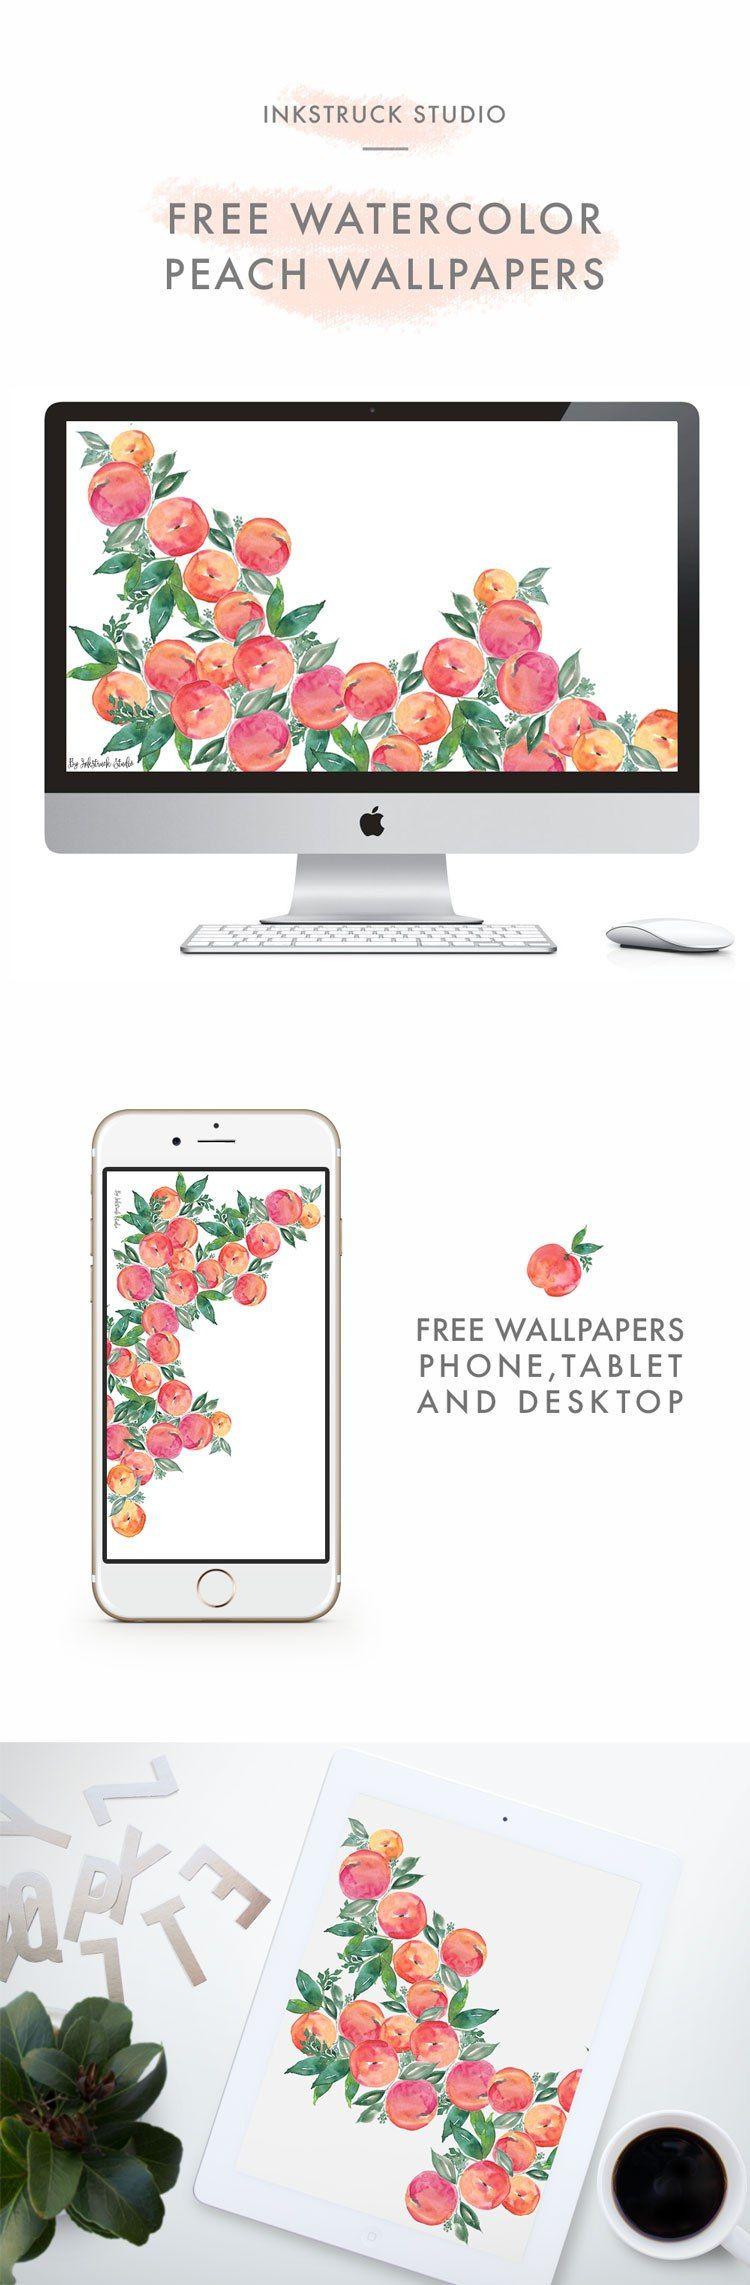 FREE WATERCOLOR PEACH WALLPAPERS Free ipad wallpaper